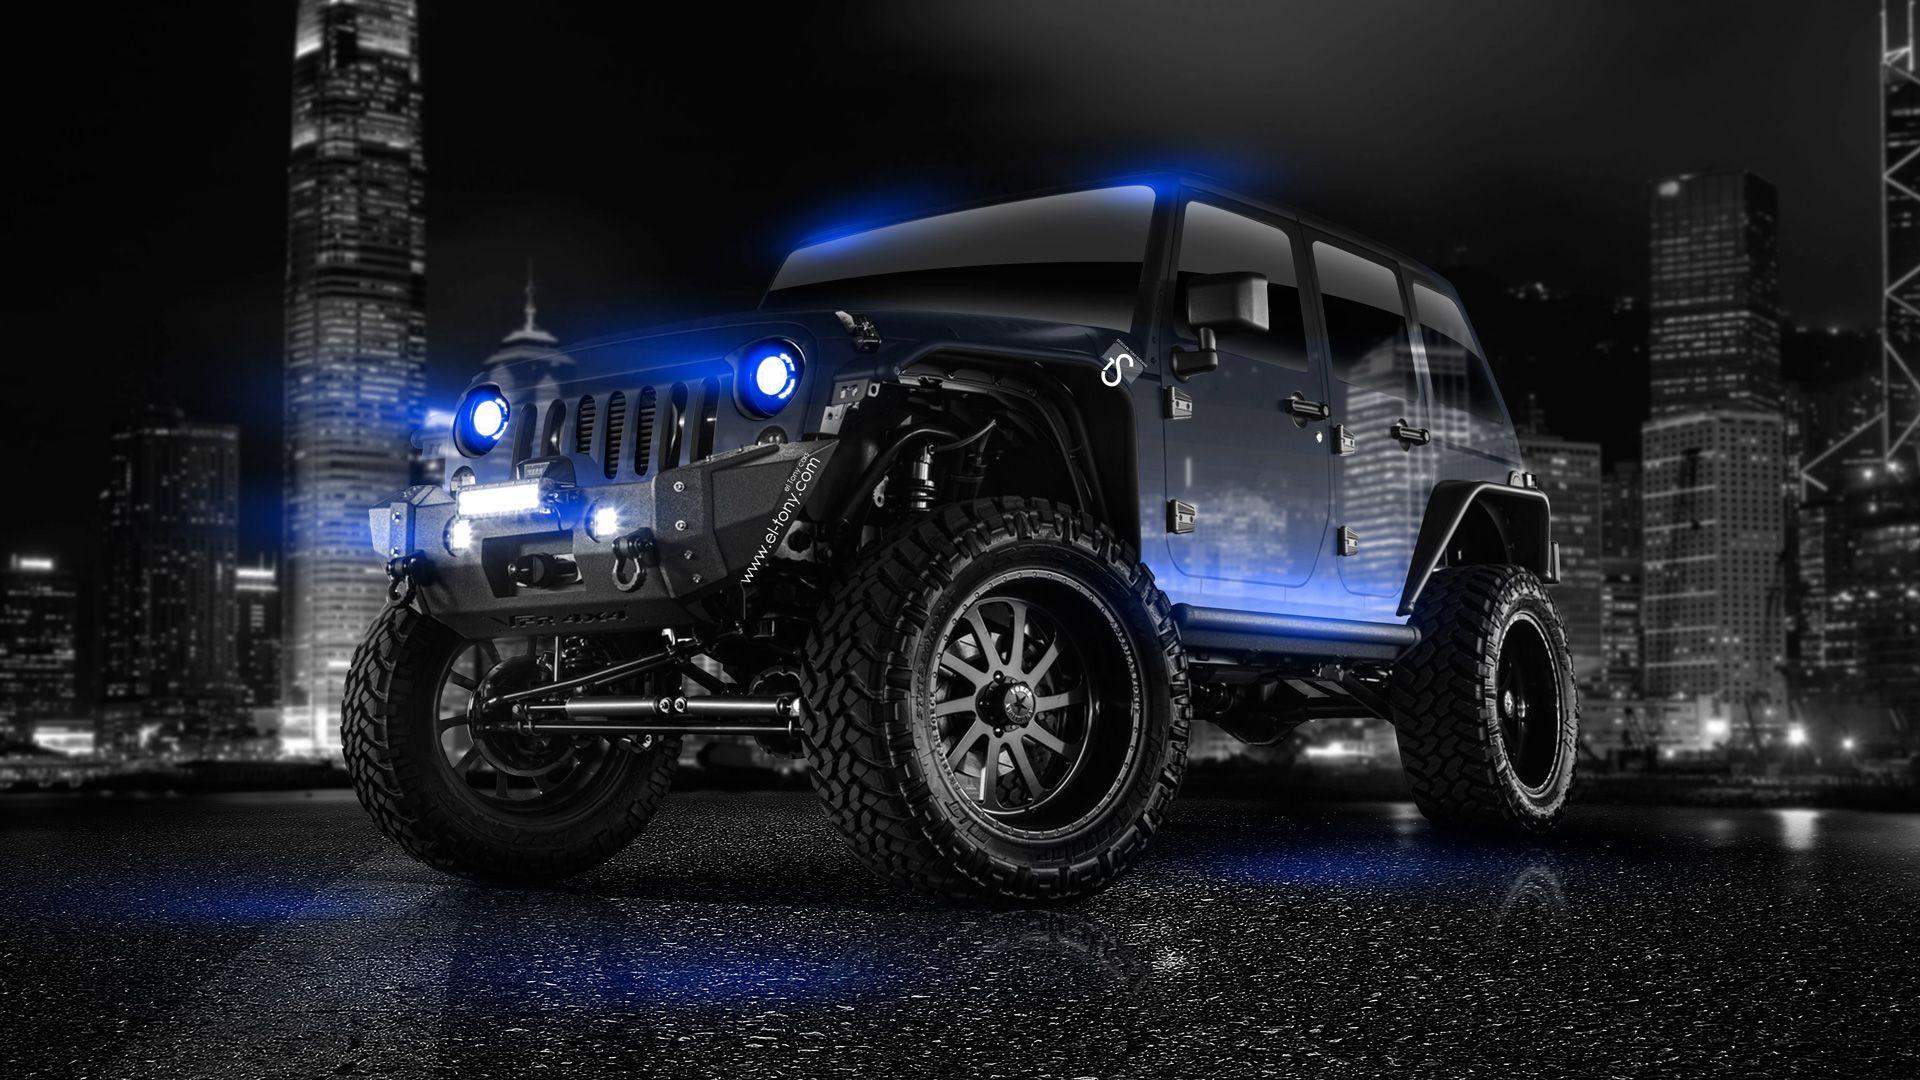 Hd wallpaper jeep - Jeep Wrangler Crystal City Car 2014 Blue Neon